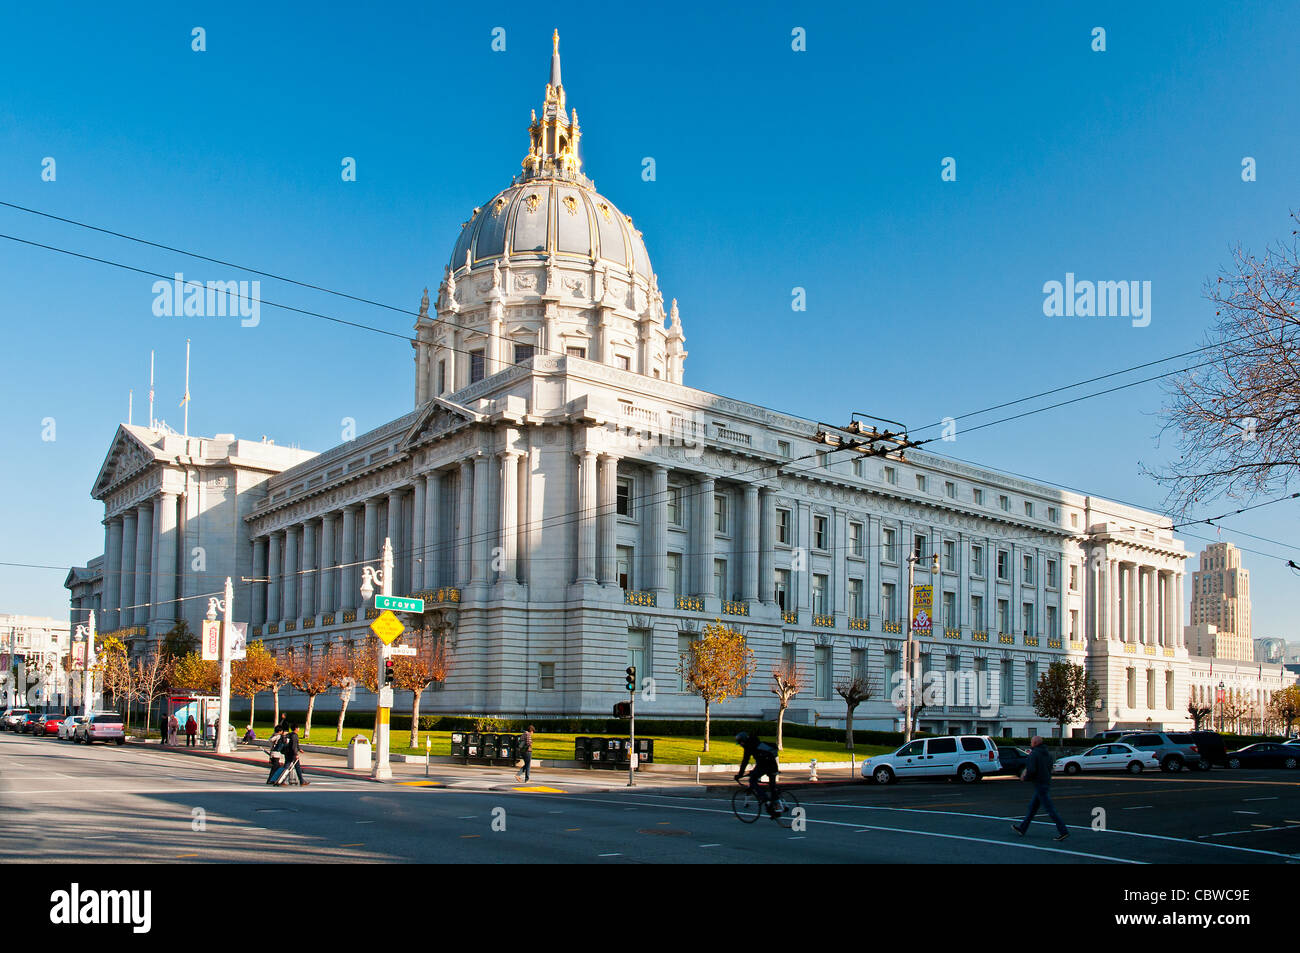 City Hall at Civic Center Plaza, San Francisco, California, USA - Stock Image